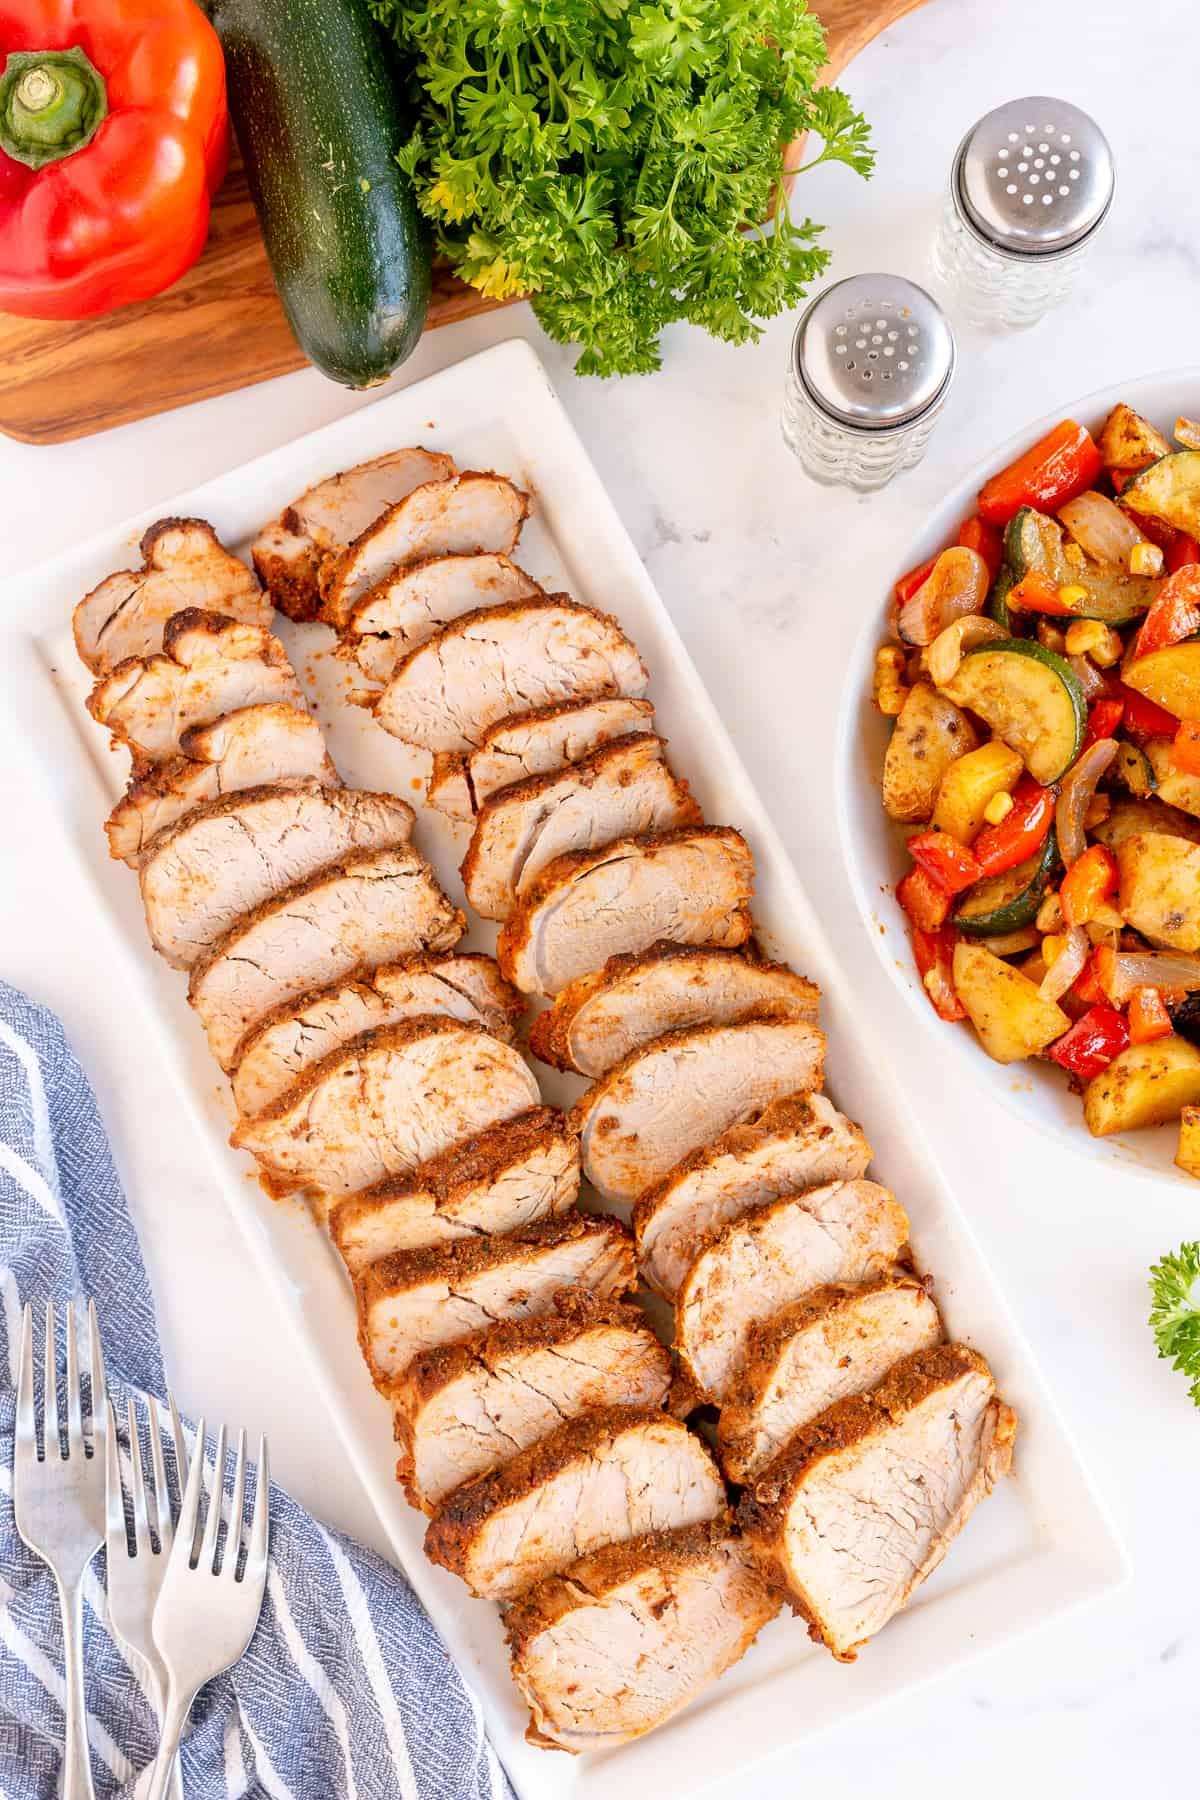 Sliced pork tenderloin on a serving platter next to a bowl of vegetables.